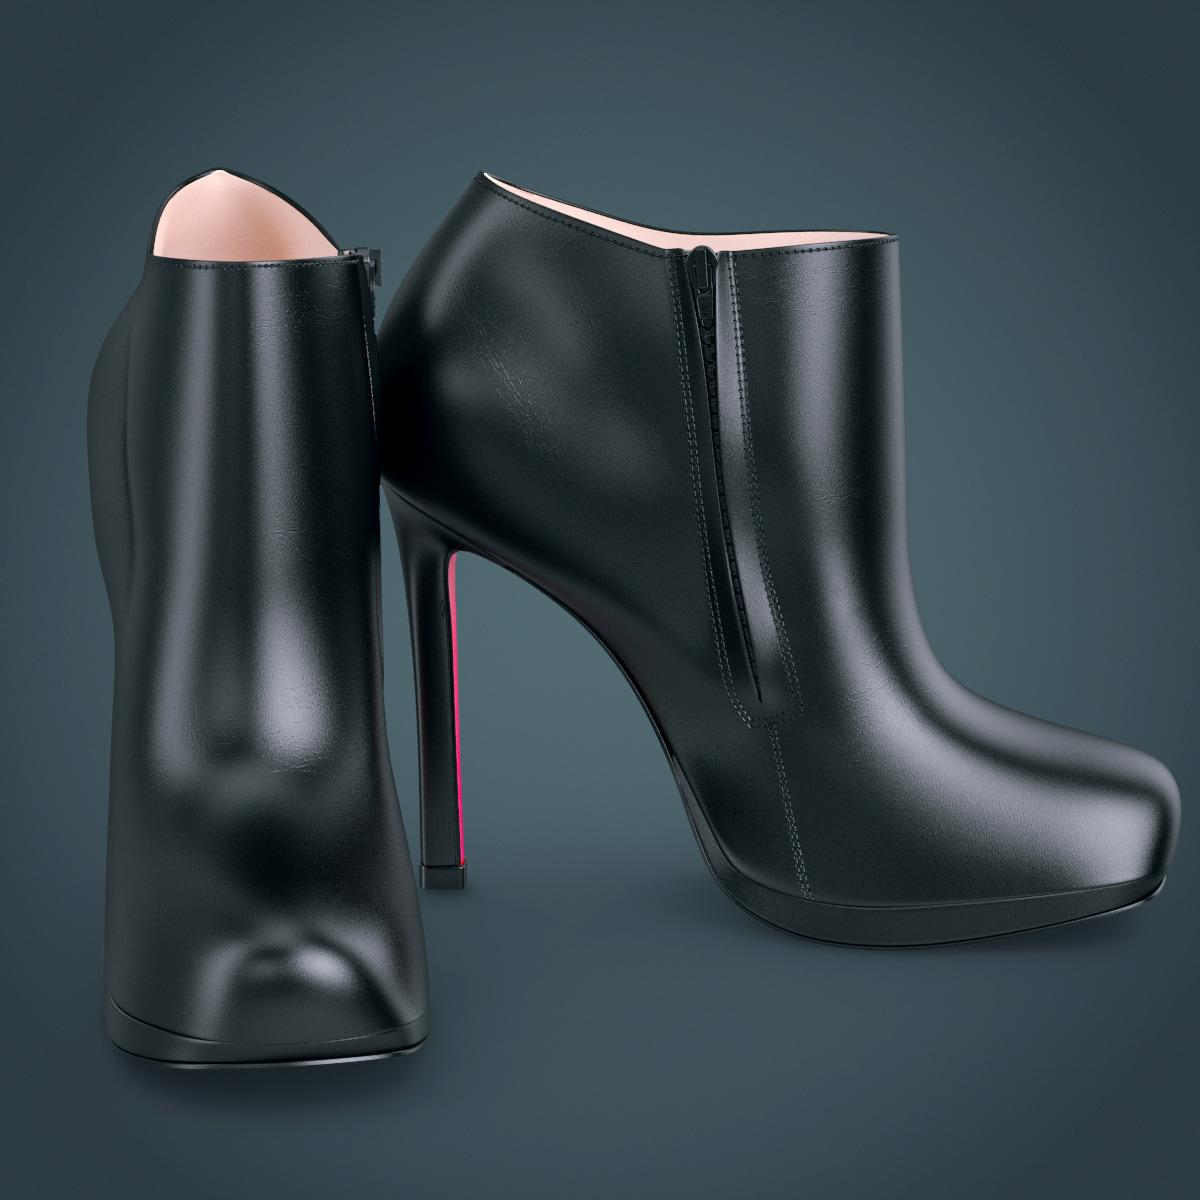 3dsmax shoes louboutin belle